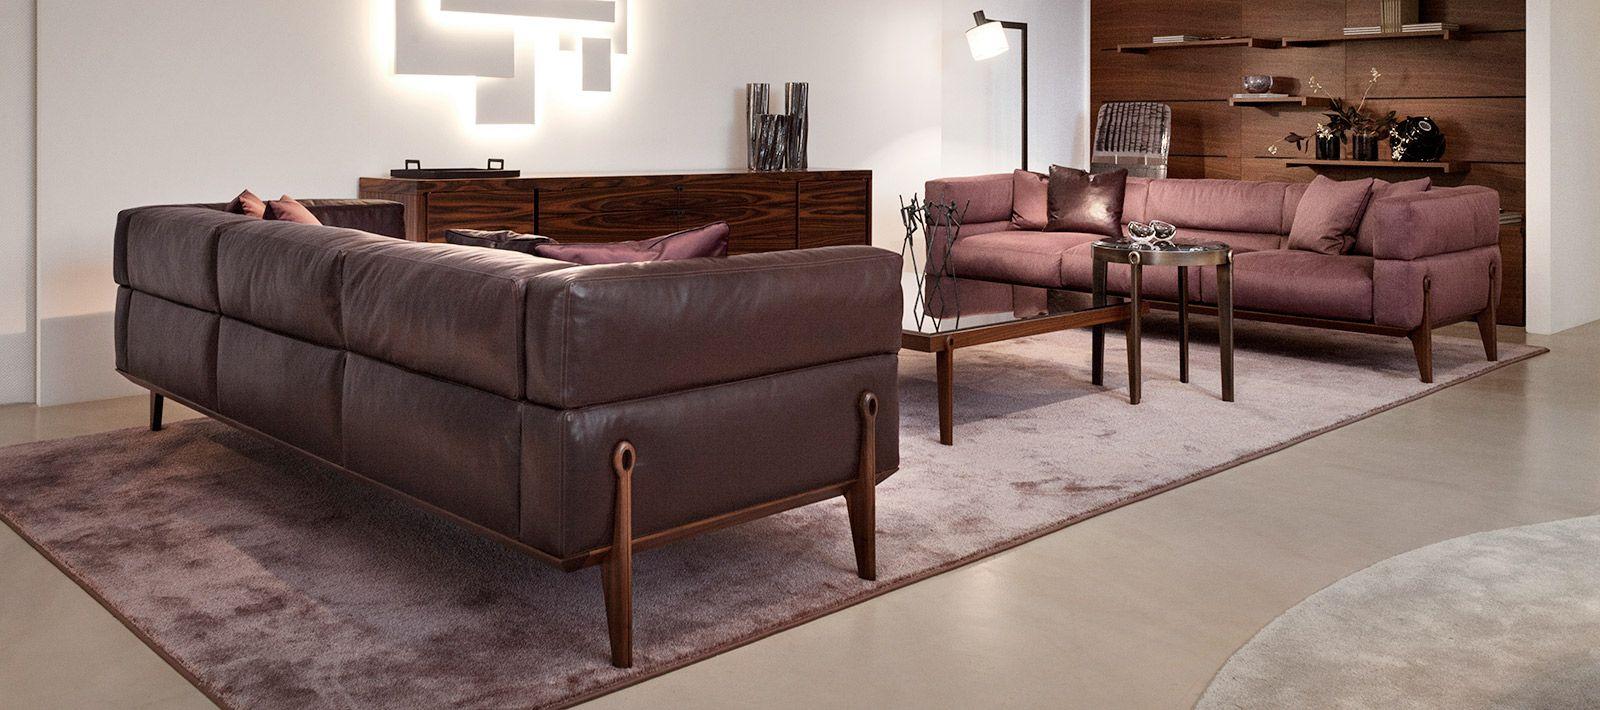 S.p.a. Interior furniture